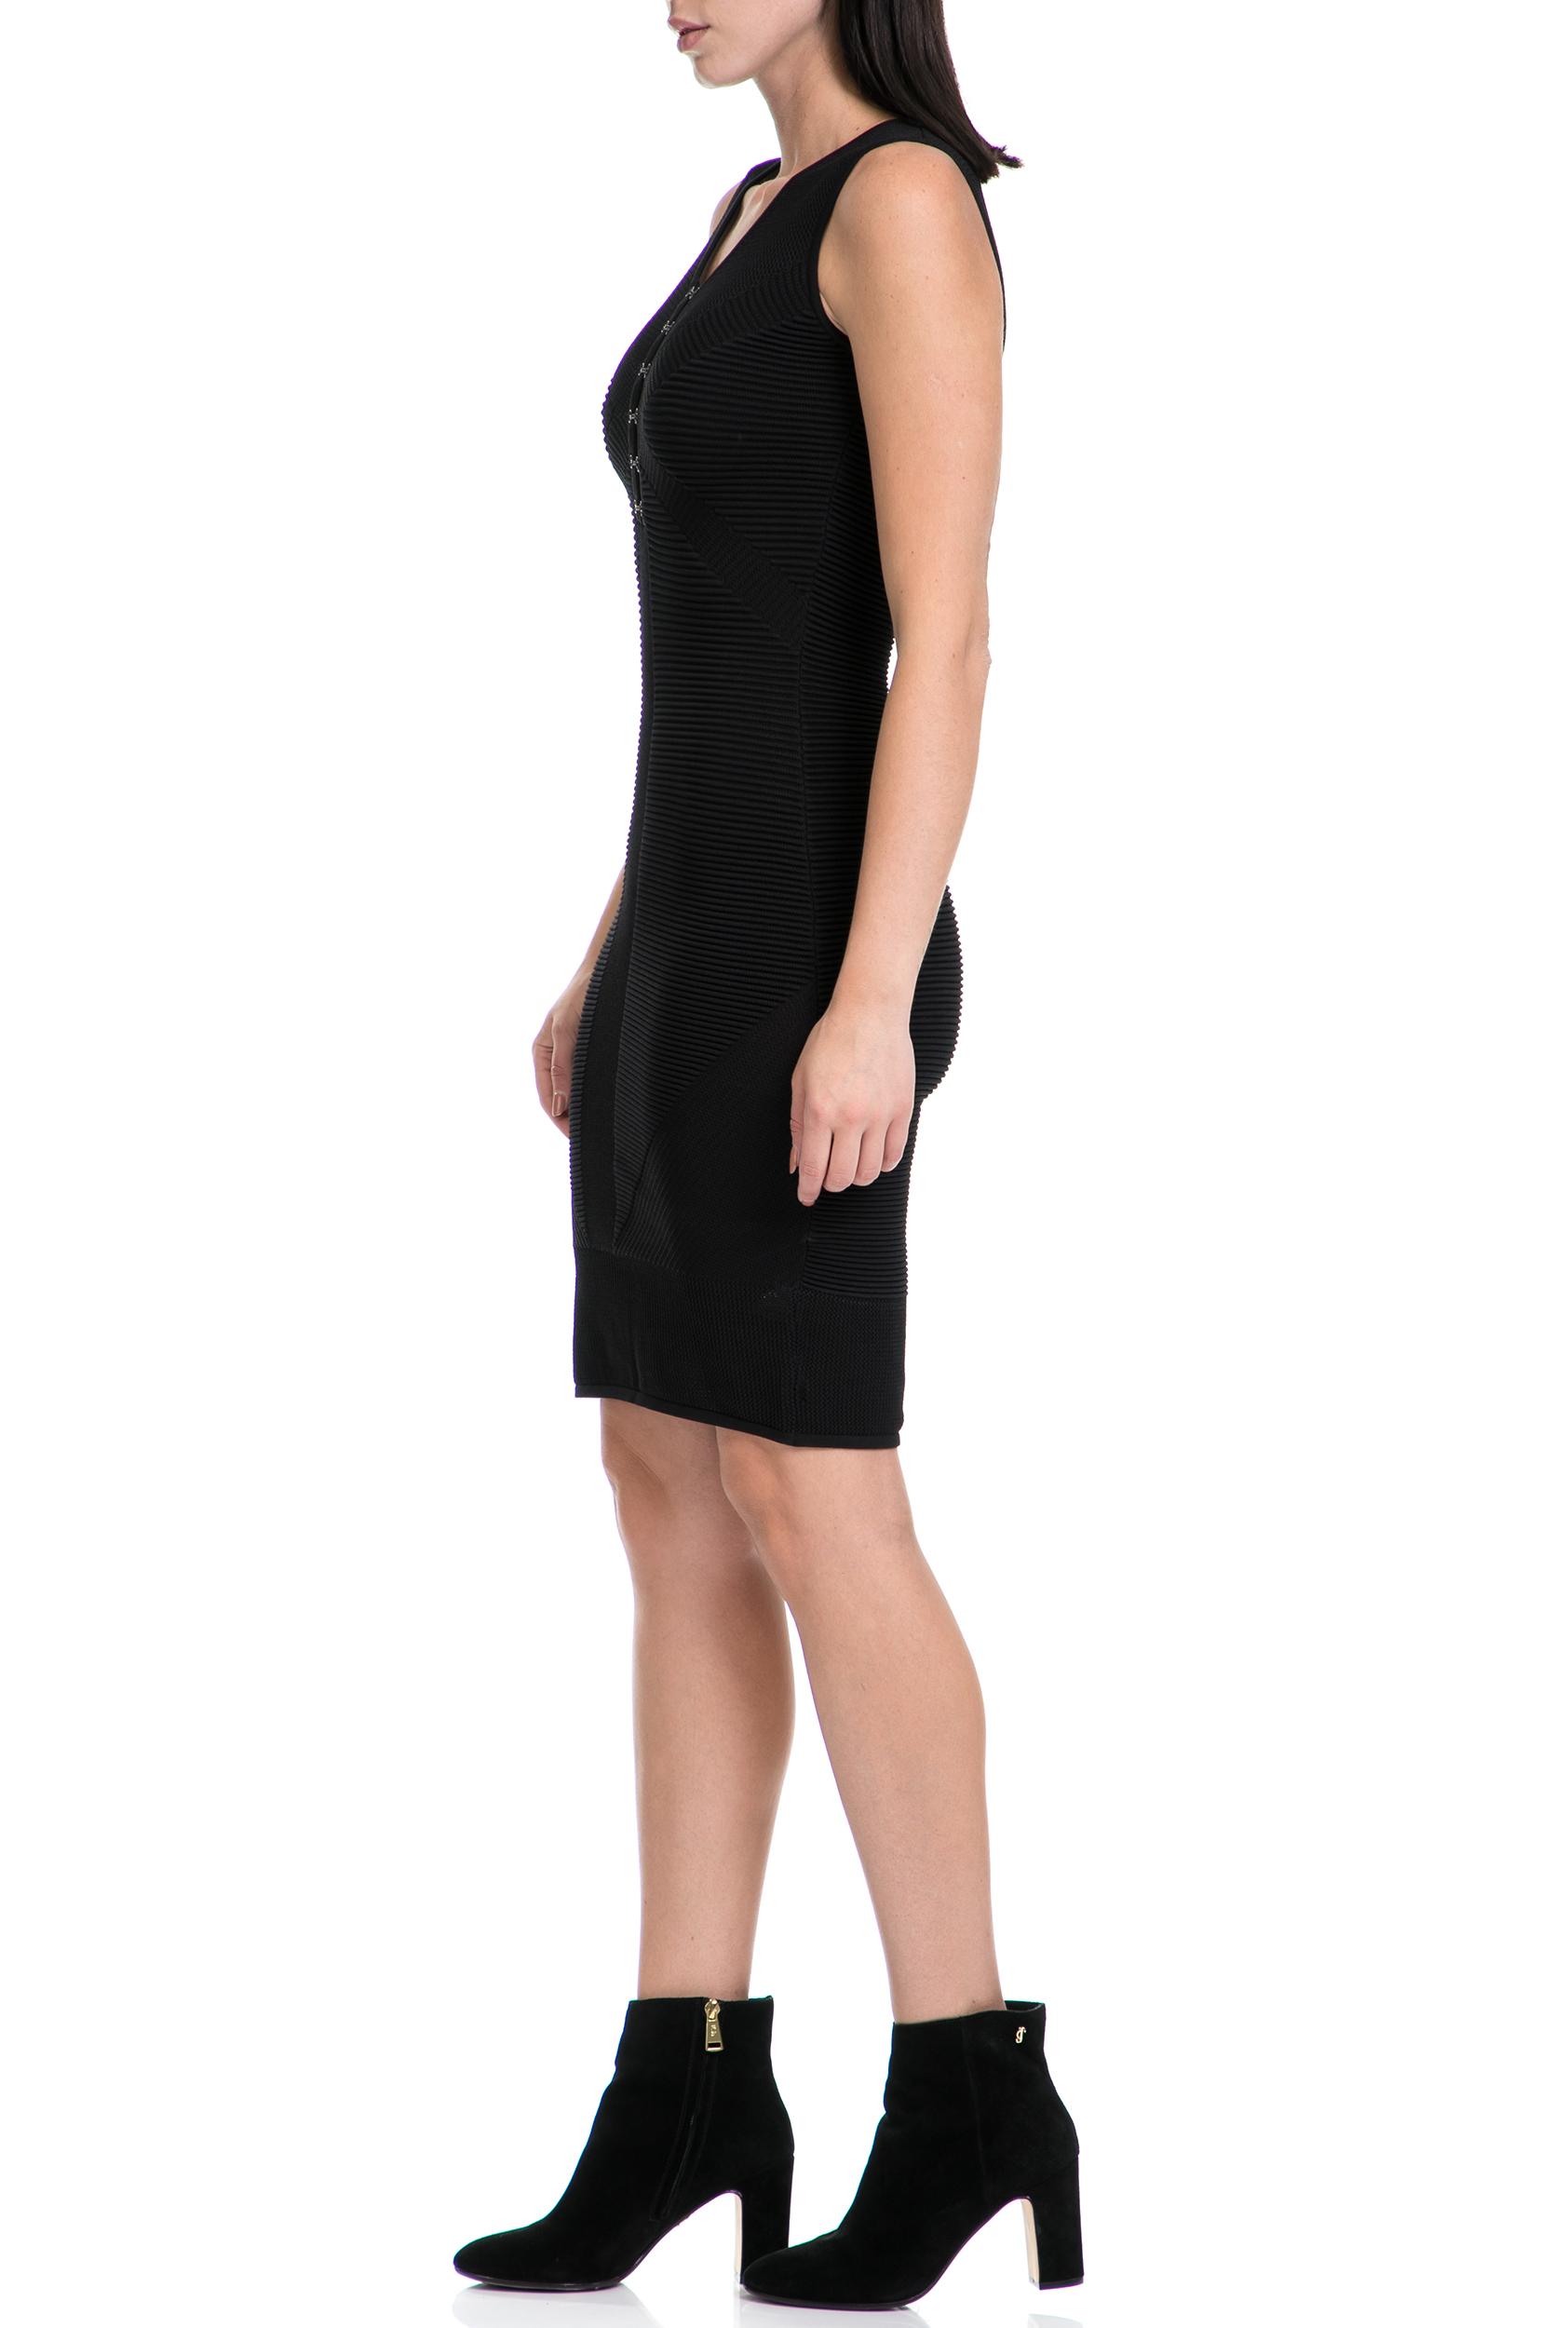 62b0a8c71b9 GUESS - Γυναικείο φόρεμα ANGELINA GUESS μαύρο, ΓΥΝΑΙΚΑ | ΡΟΥΧΑ | ΦΟΡΕΜΑΤΑ |  ΜΕΧΡΙ ΤΟ ΓΟΝΑΤΟ